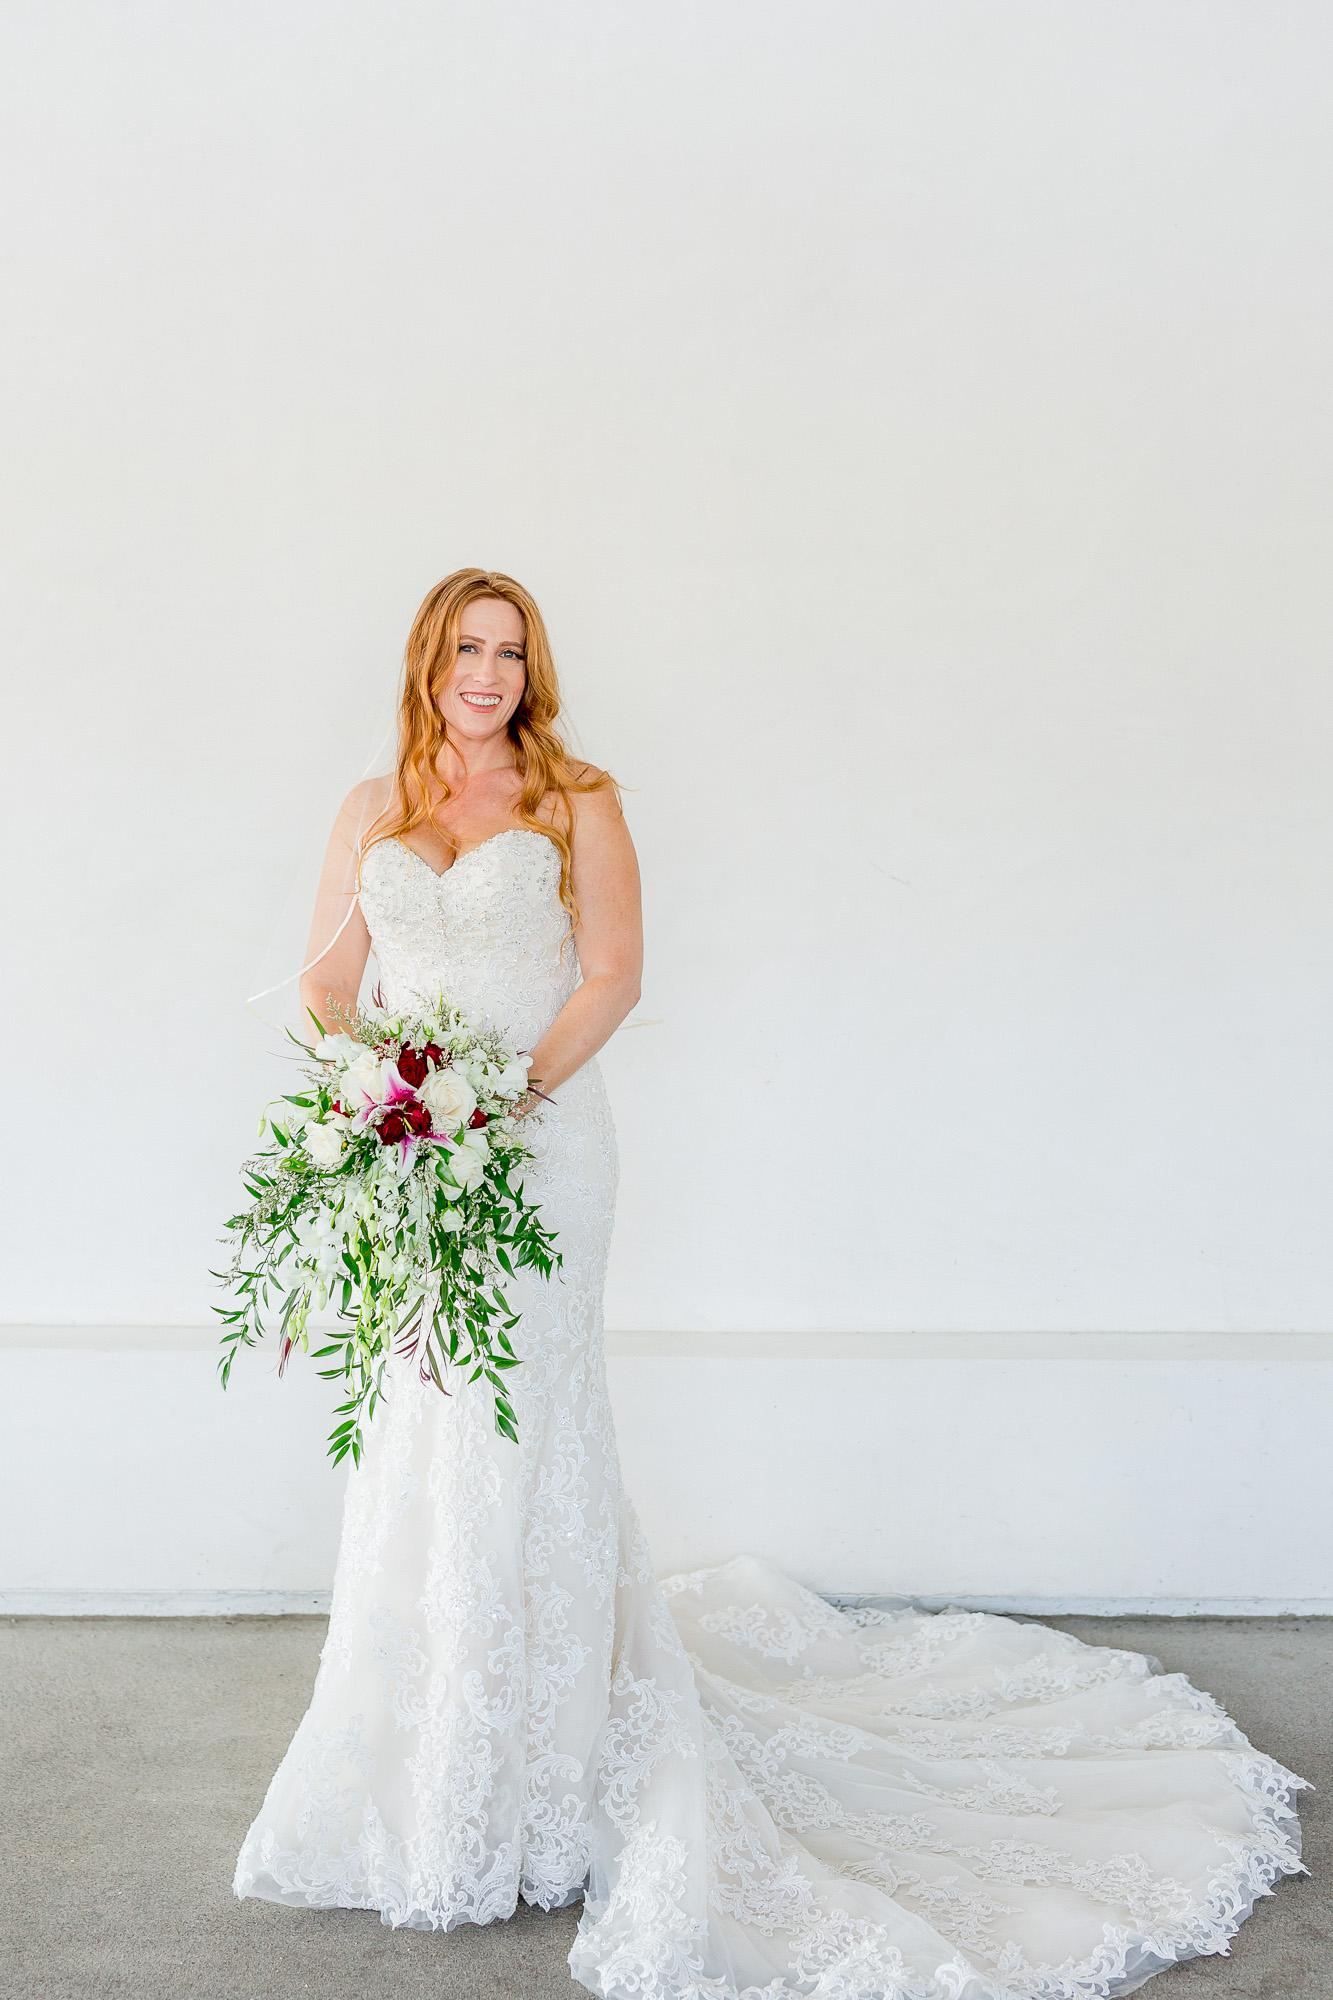 Heather_Pat_San_Marcos_Lakehouse_Wedding_192.jpg